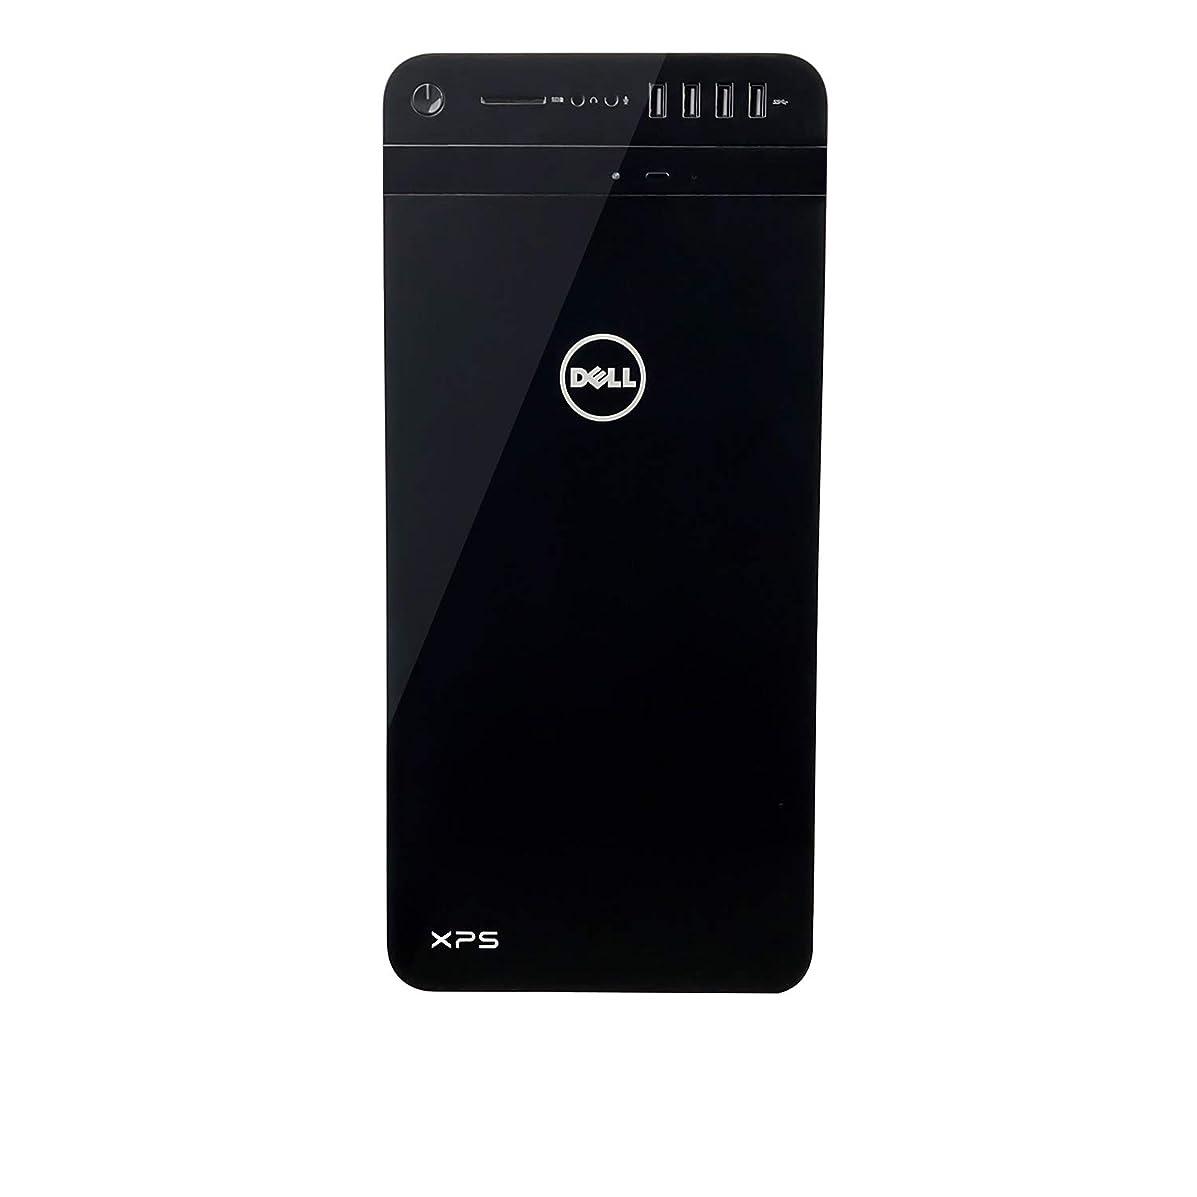 Dell XPS 8920 Desktop - Intel Core i7-7700 7th Generation Quad-Core up to 4.2 GHz, 64GB DDR4 Memory, 1TB SSD + 2TB SATA Hard Drive, 8GB Nvidia GeForce GTX 1080, DVD Burner, Windows 10 Pro